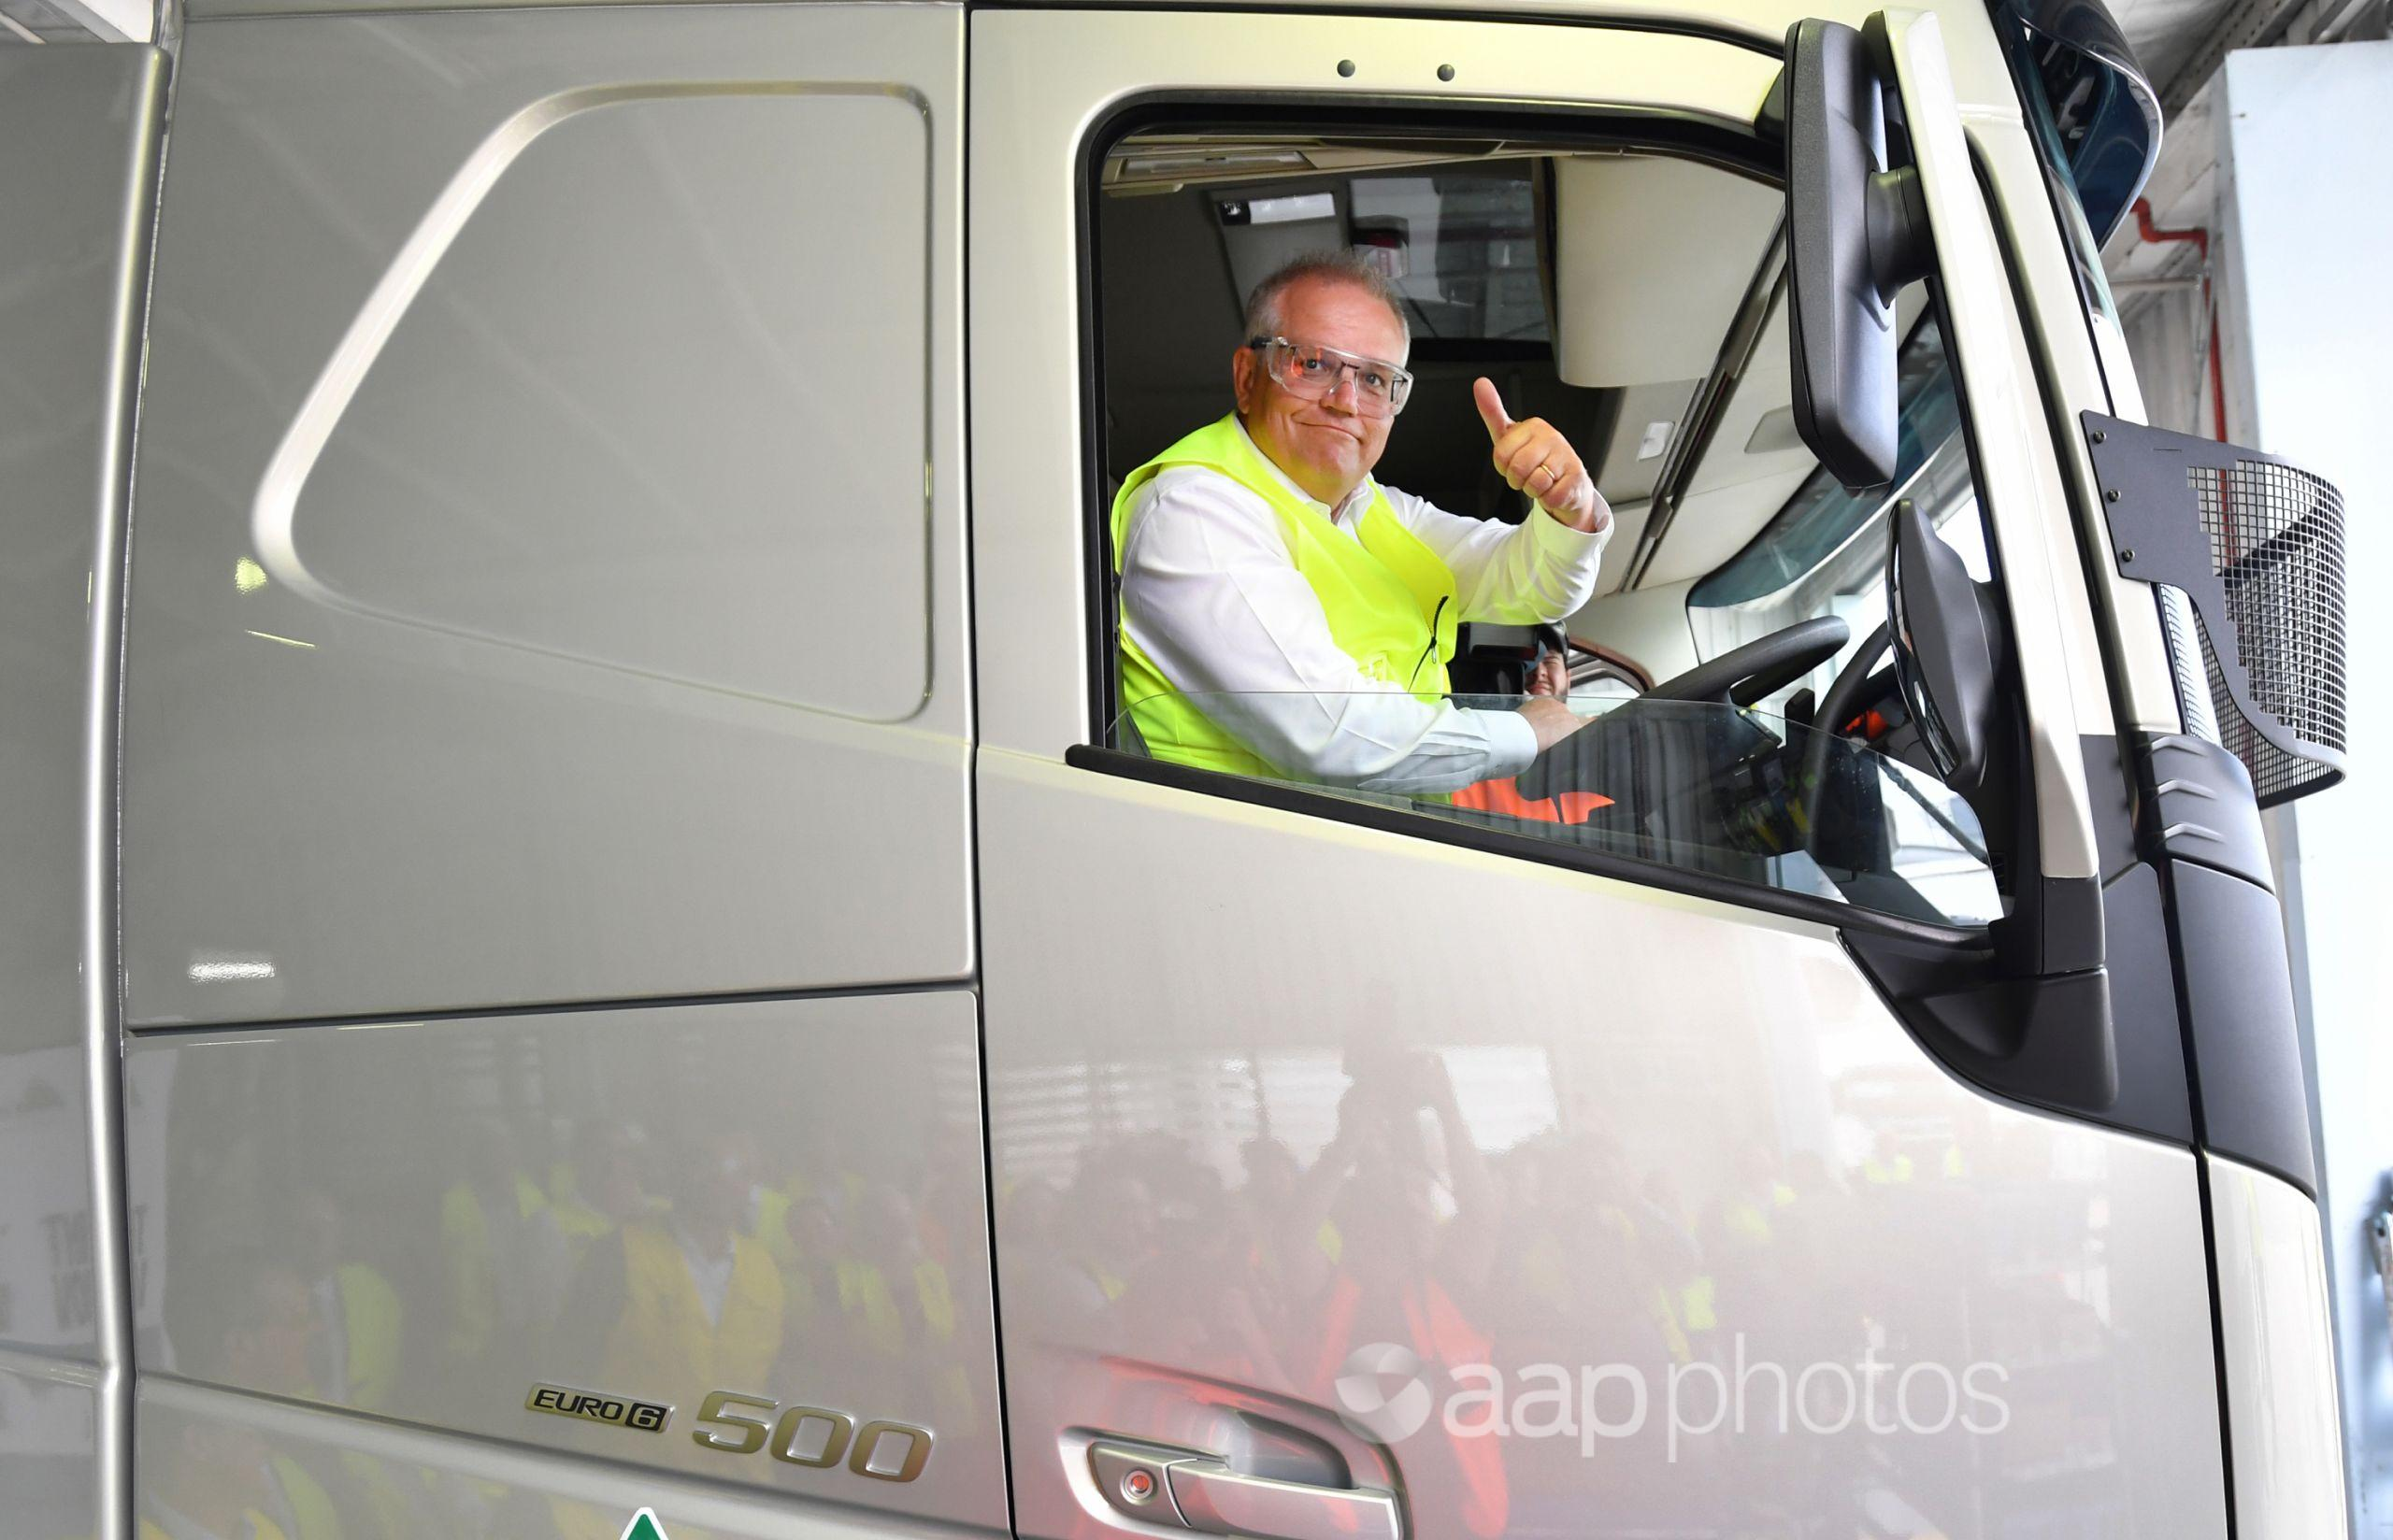 Prime Minister Scott Morrison in a truck